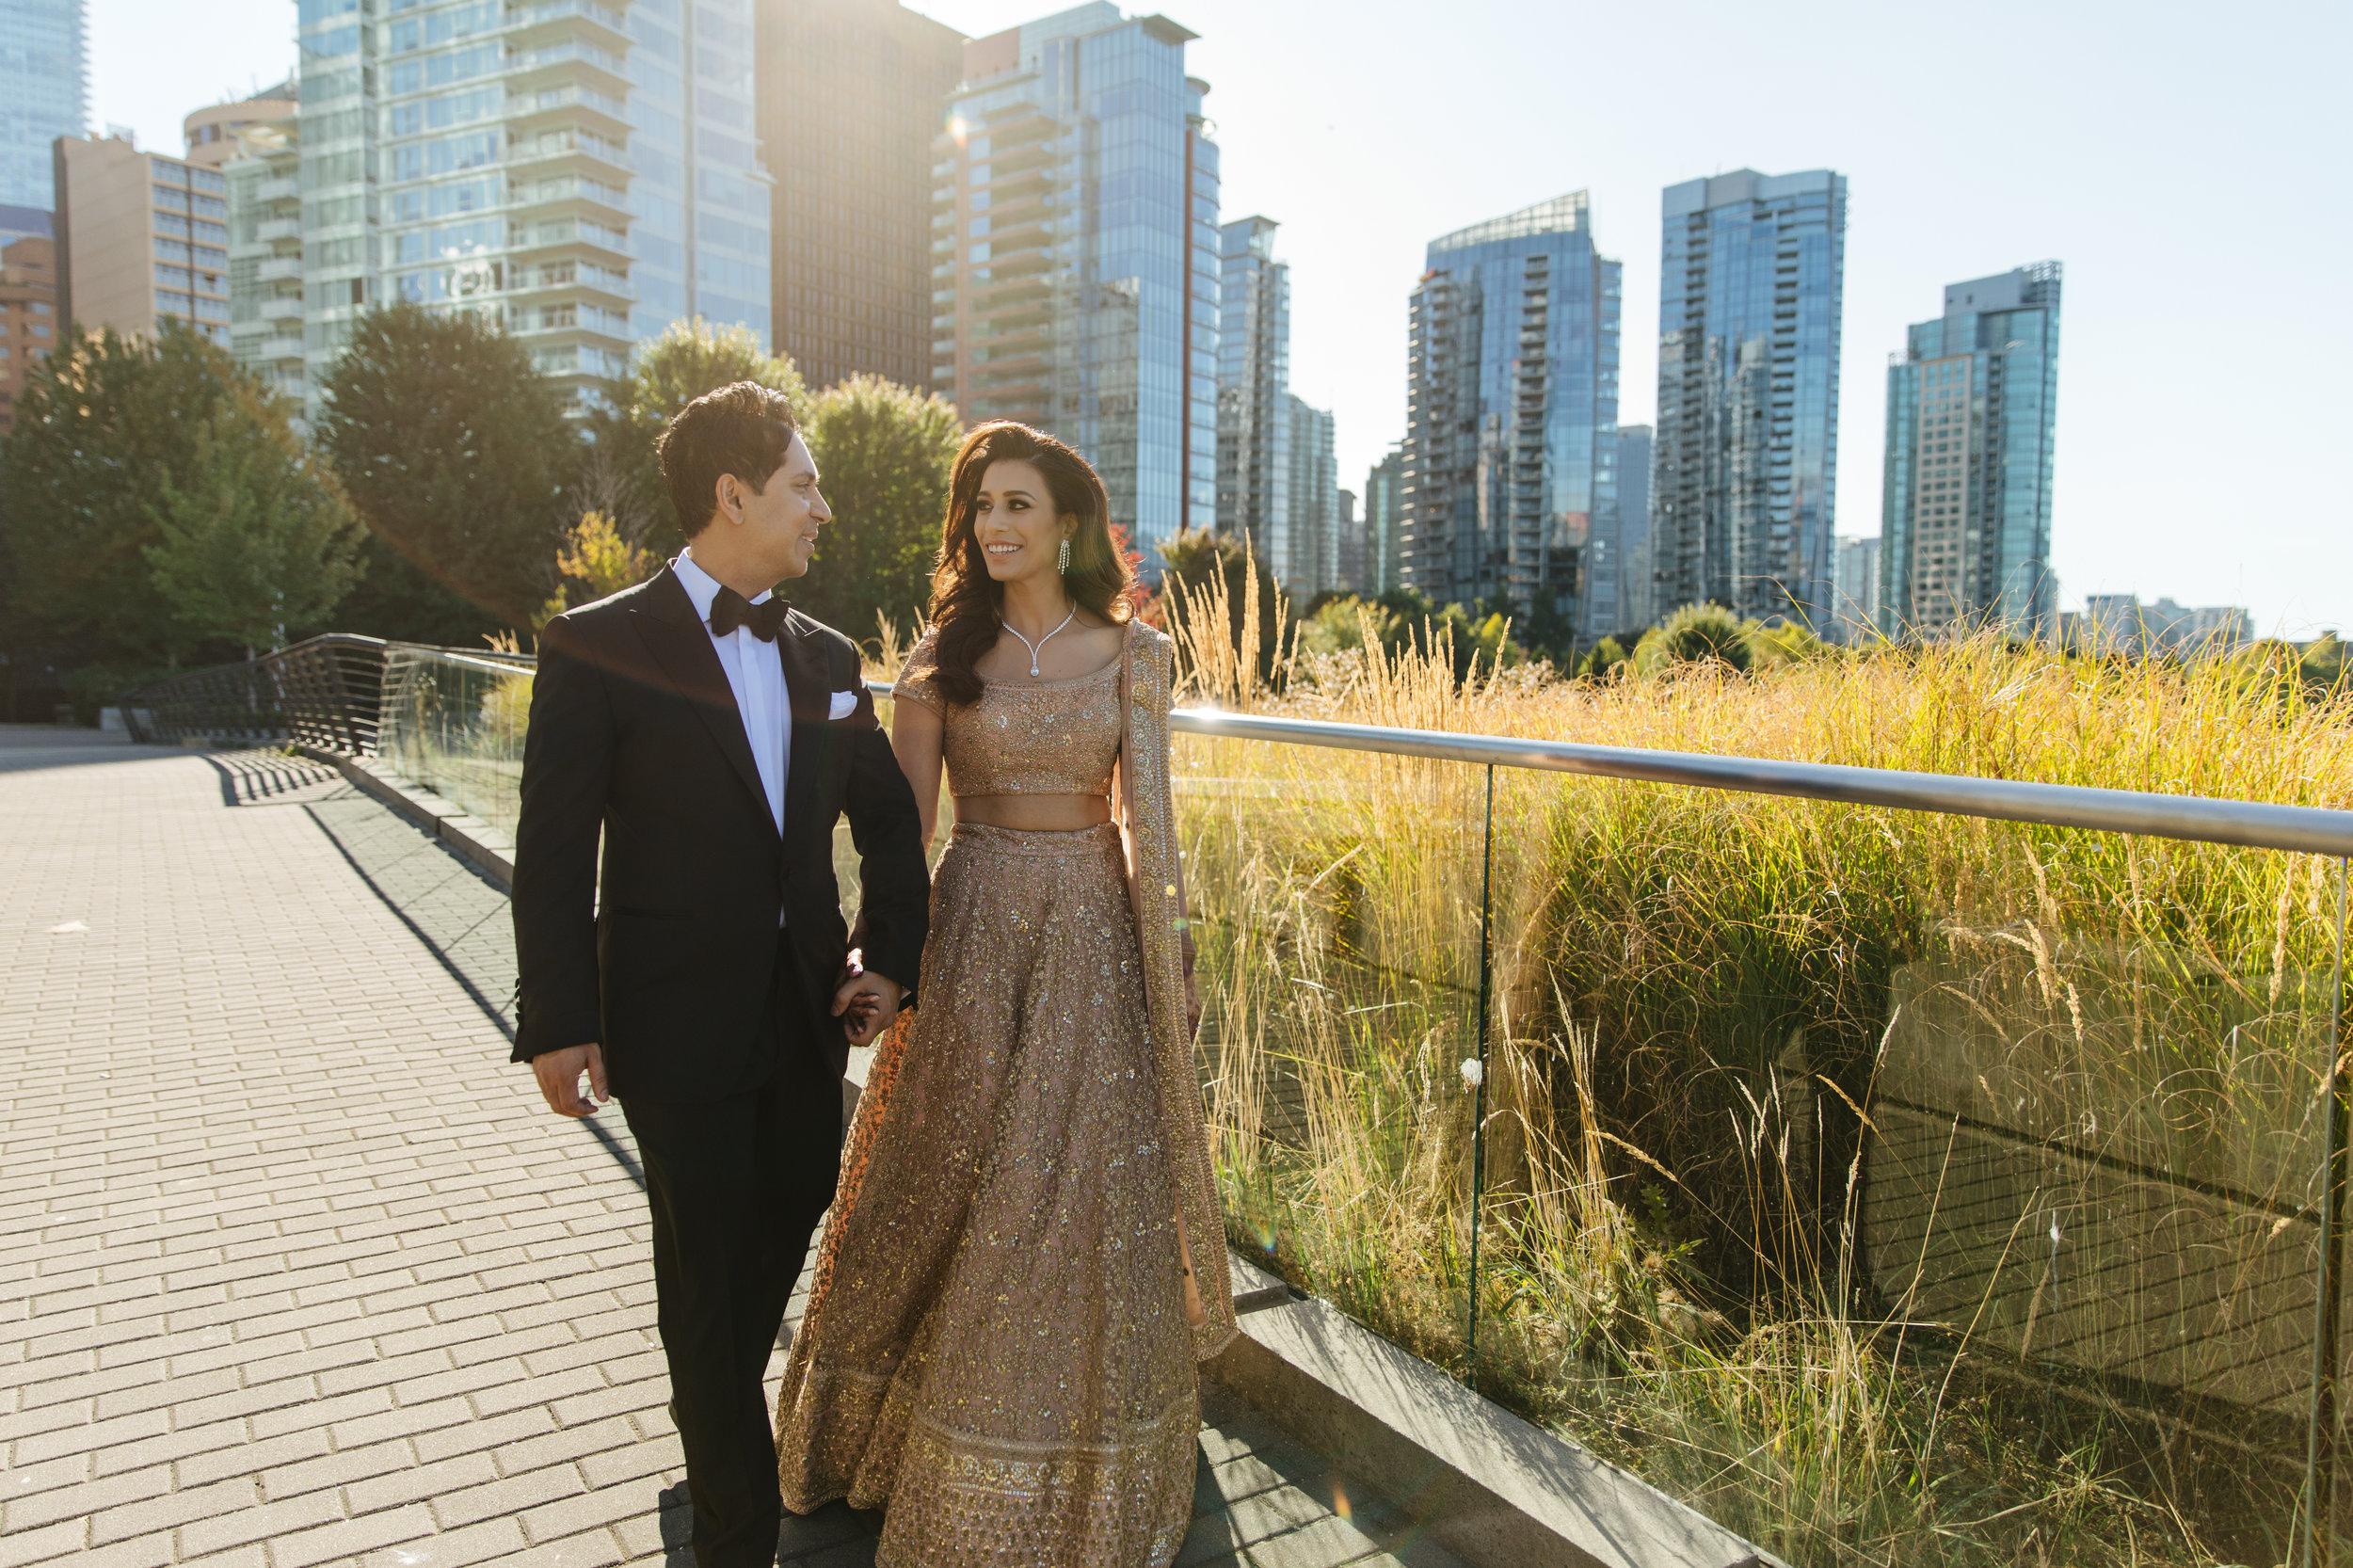 herastudios_wedding_minna_rajesh_hera_selects-110.jpg